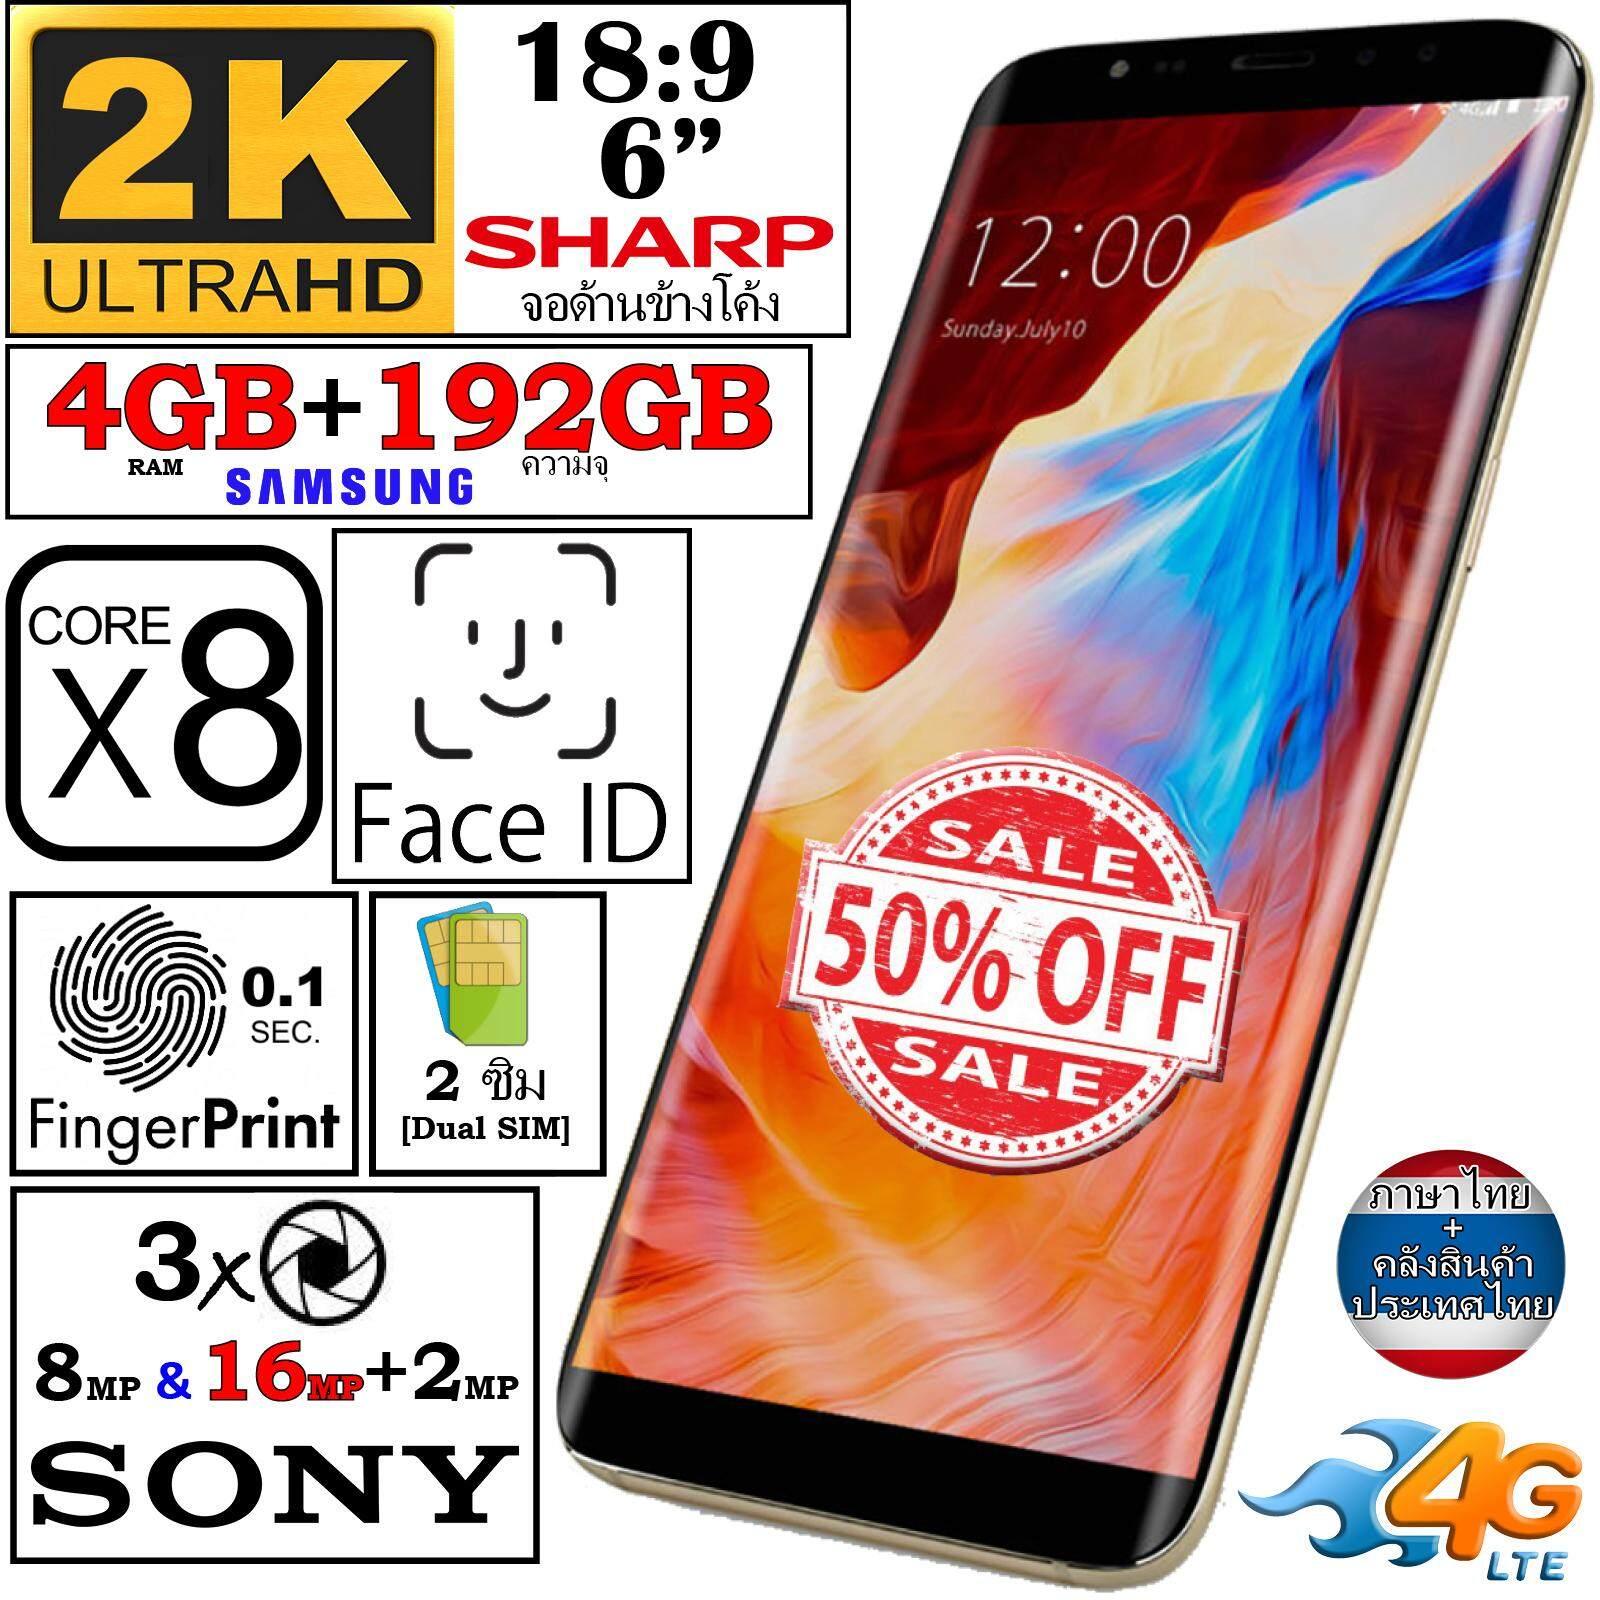 320GB+4GB จอ2Kโค้ง ลายนิ้วมือ FaceID กล้องคู่16MP OctaCore 4G LTE 2ซิม KOOLNEE K1 64GB ROM สีดำ สีน้ำเงิน